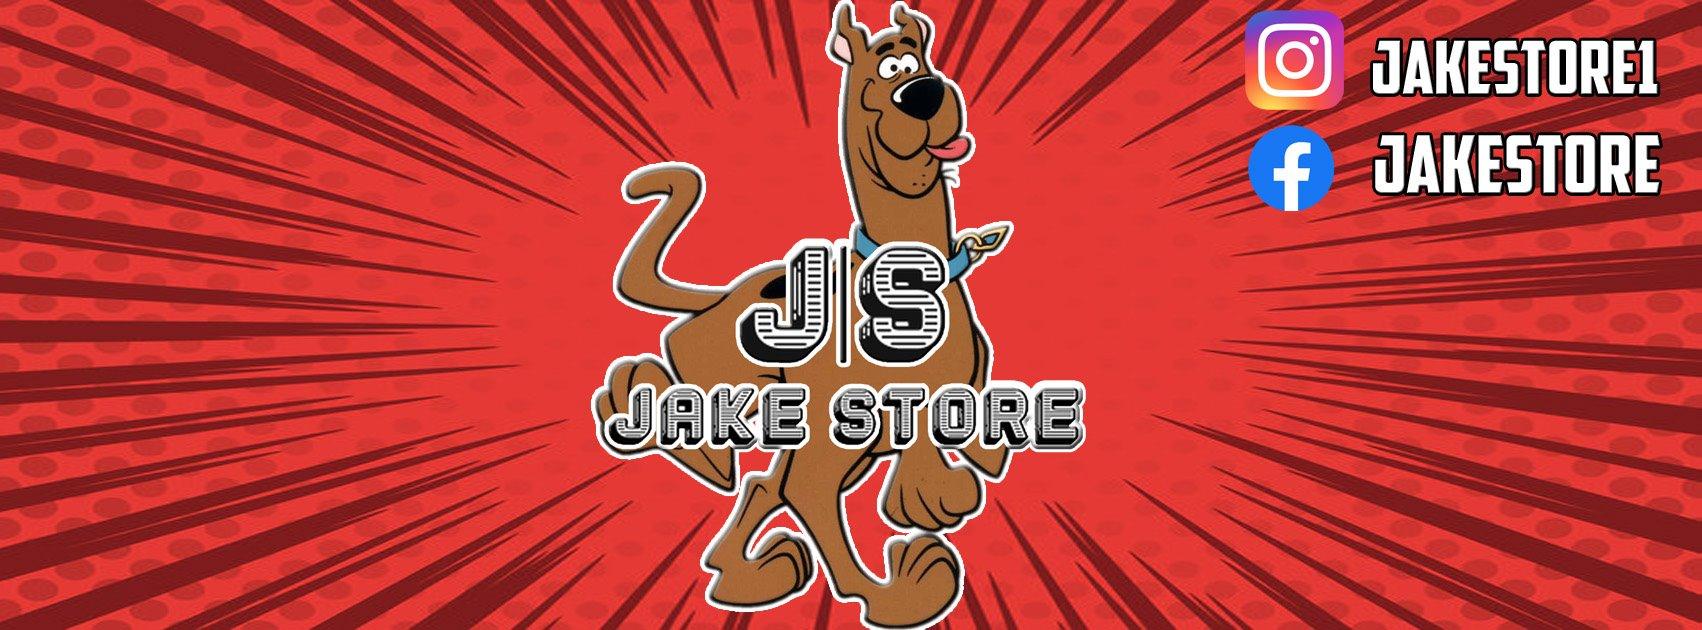 JakeStore